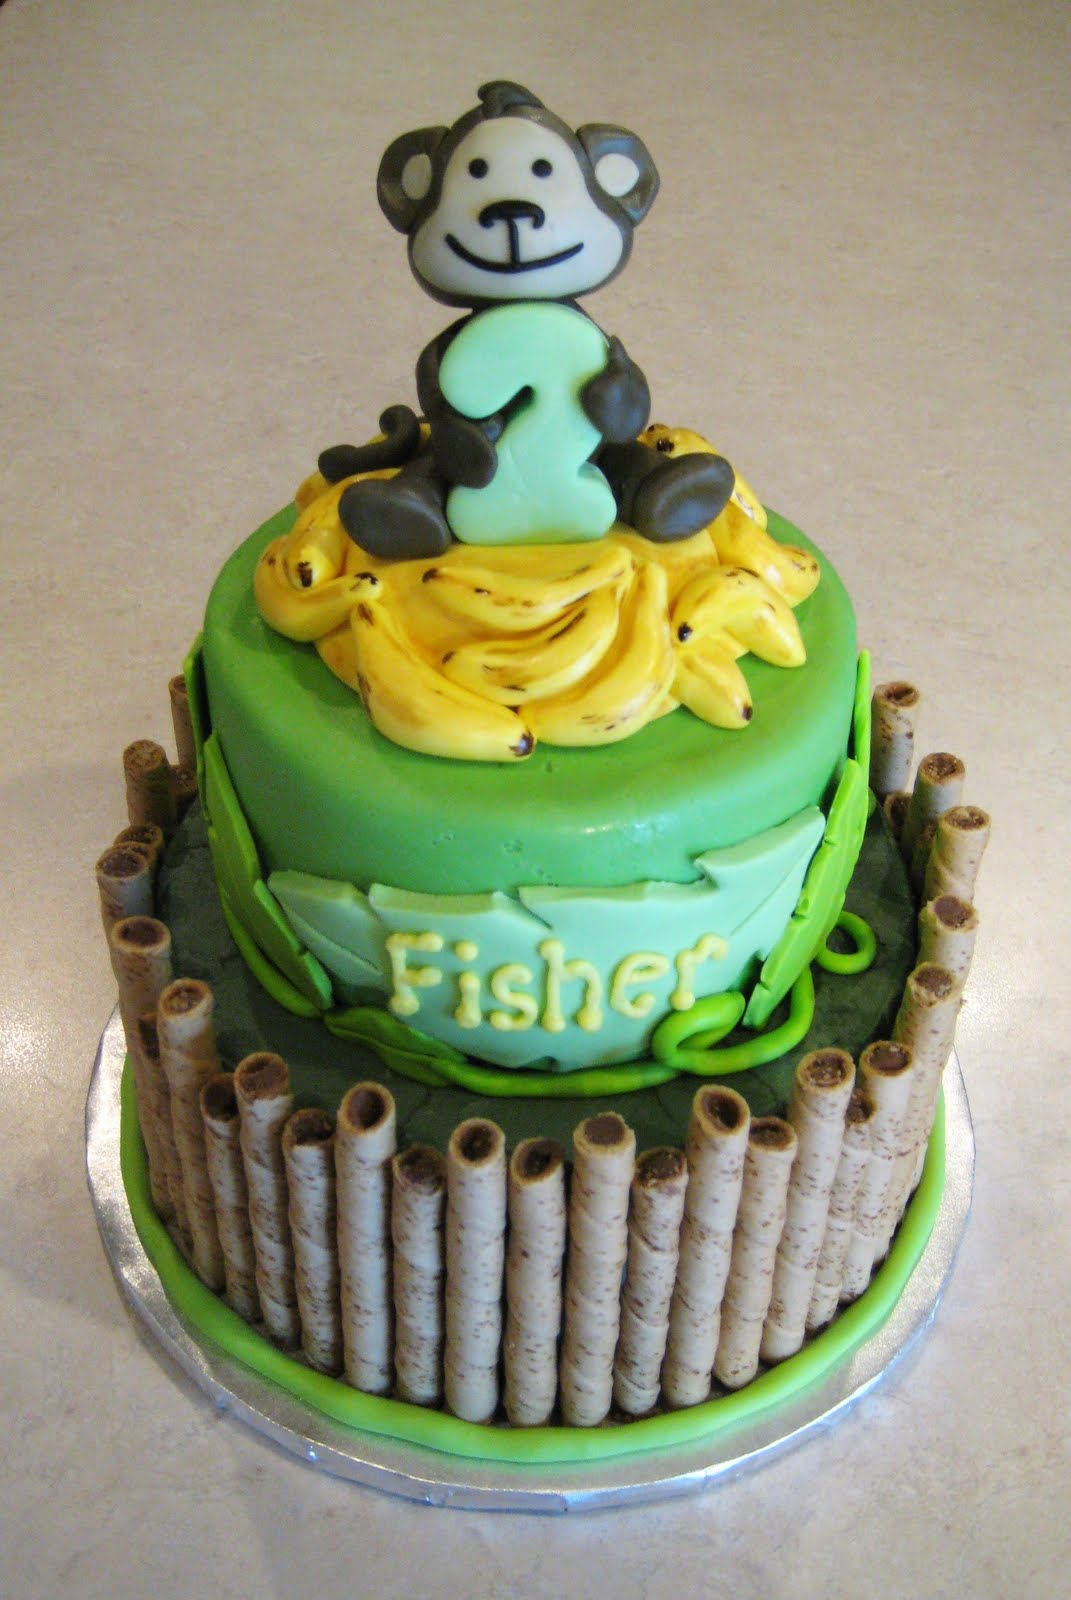 Fondant Monkey On Top Of Cake